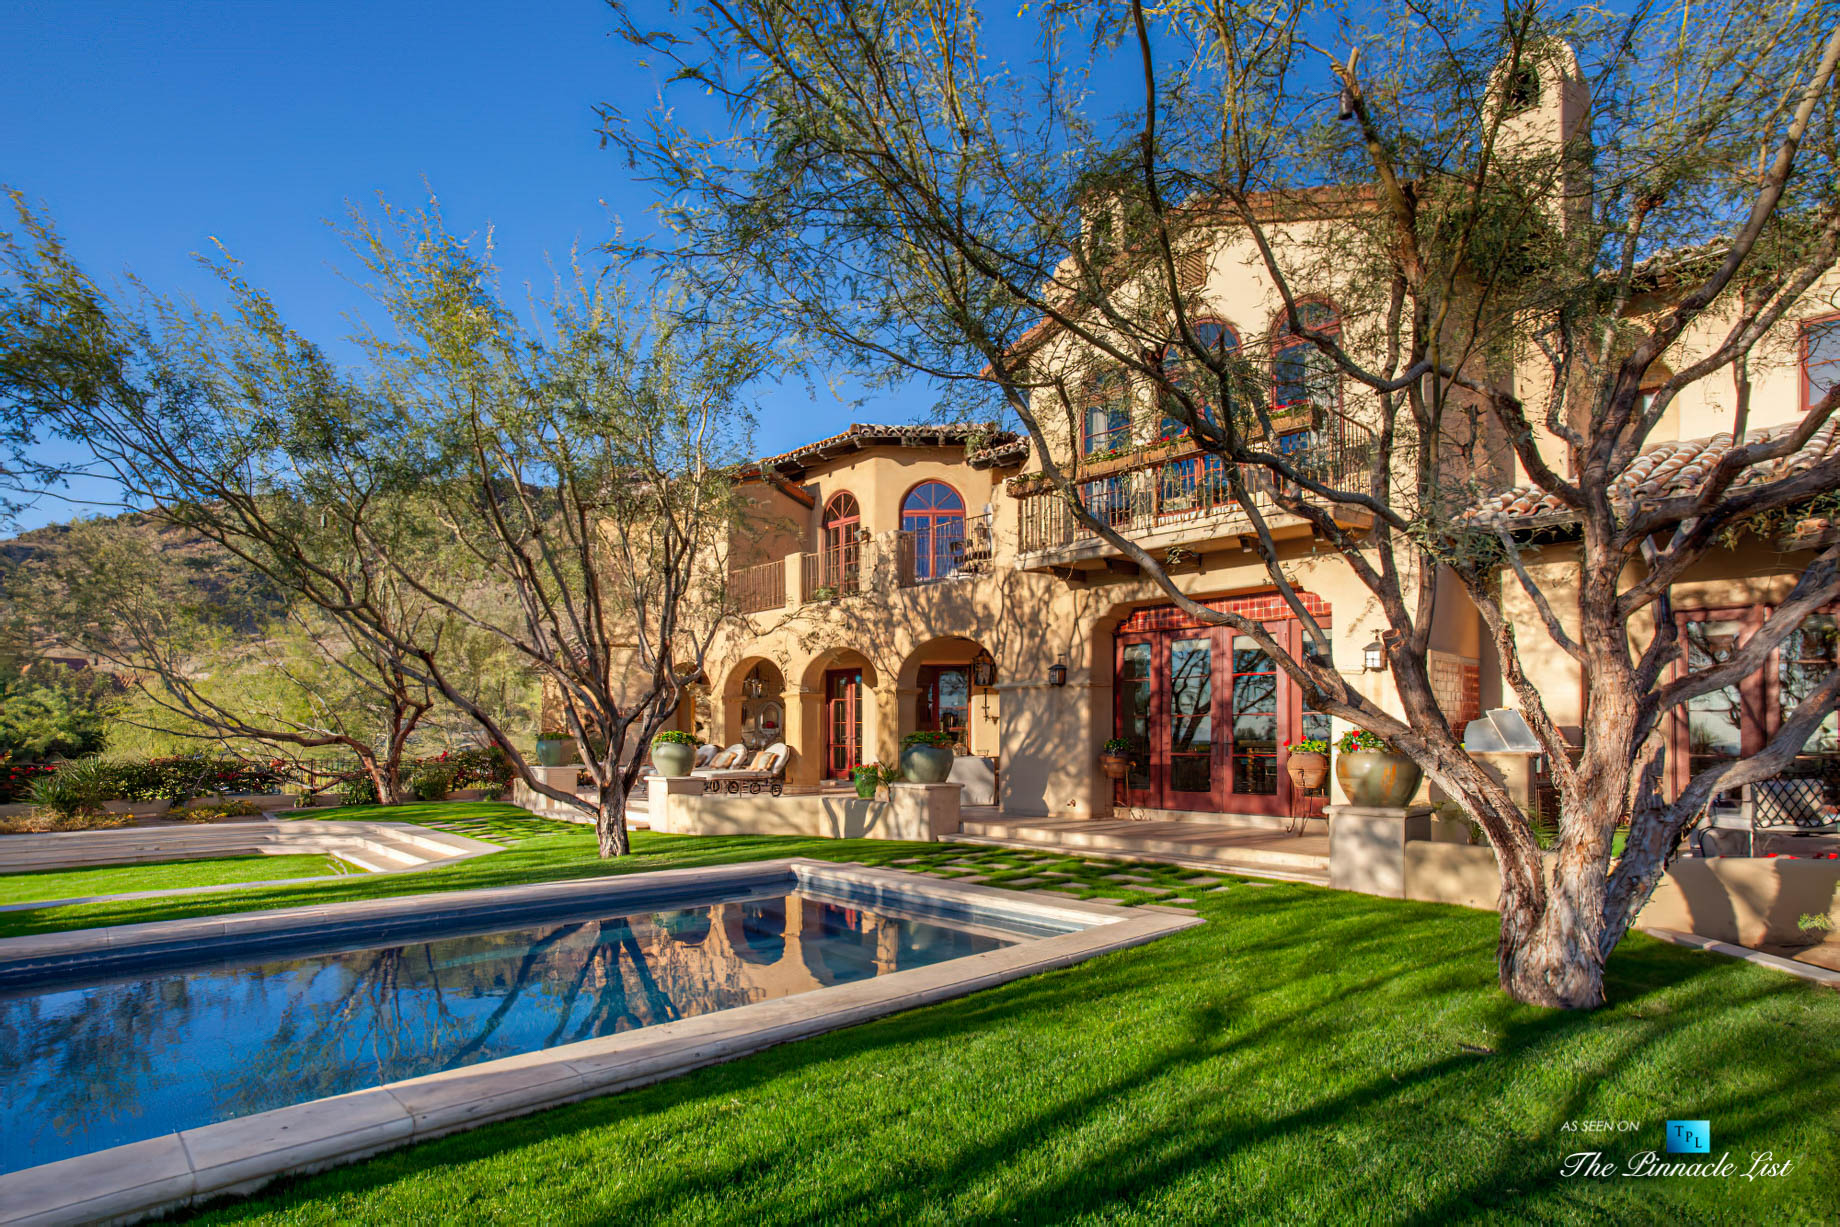 6539 N 31st Pl, Phoenix, AZ, USA - Back Yard Pool - Luxury Real Estate - Biltmore Mountain Estates - Spanish Colonial Home